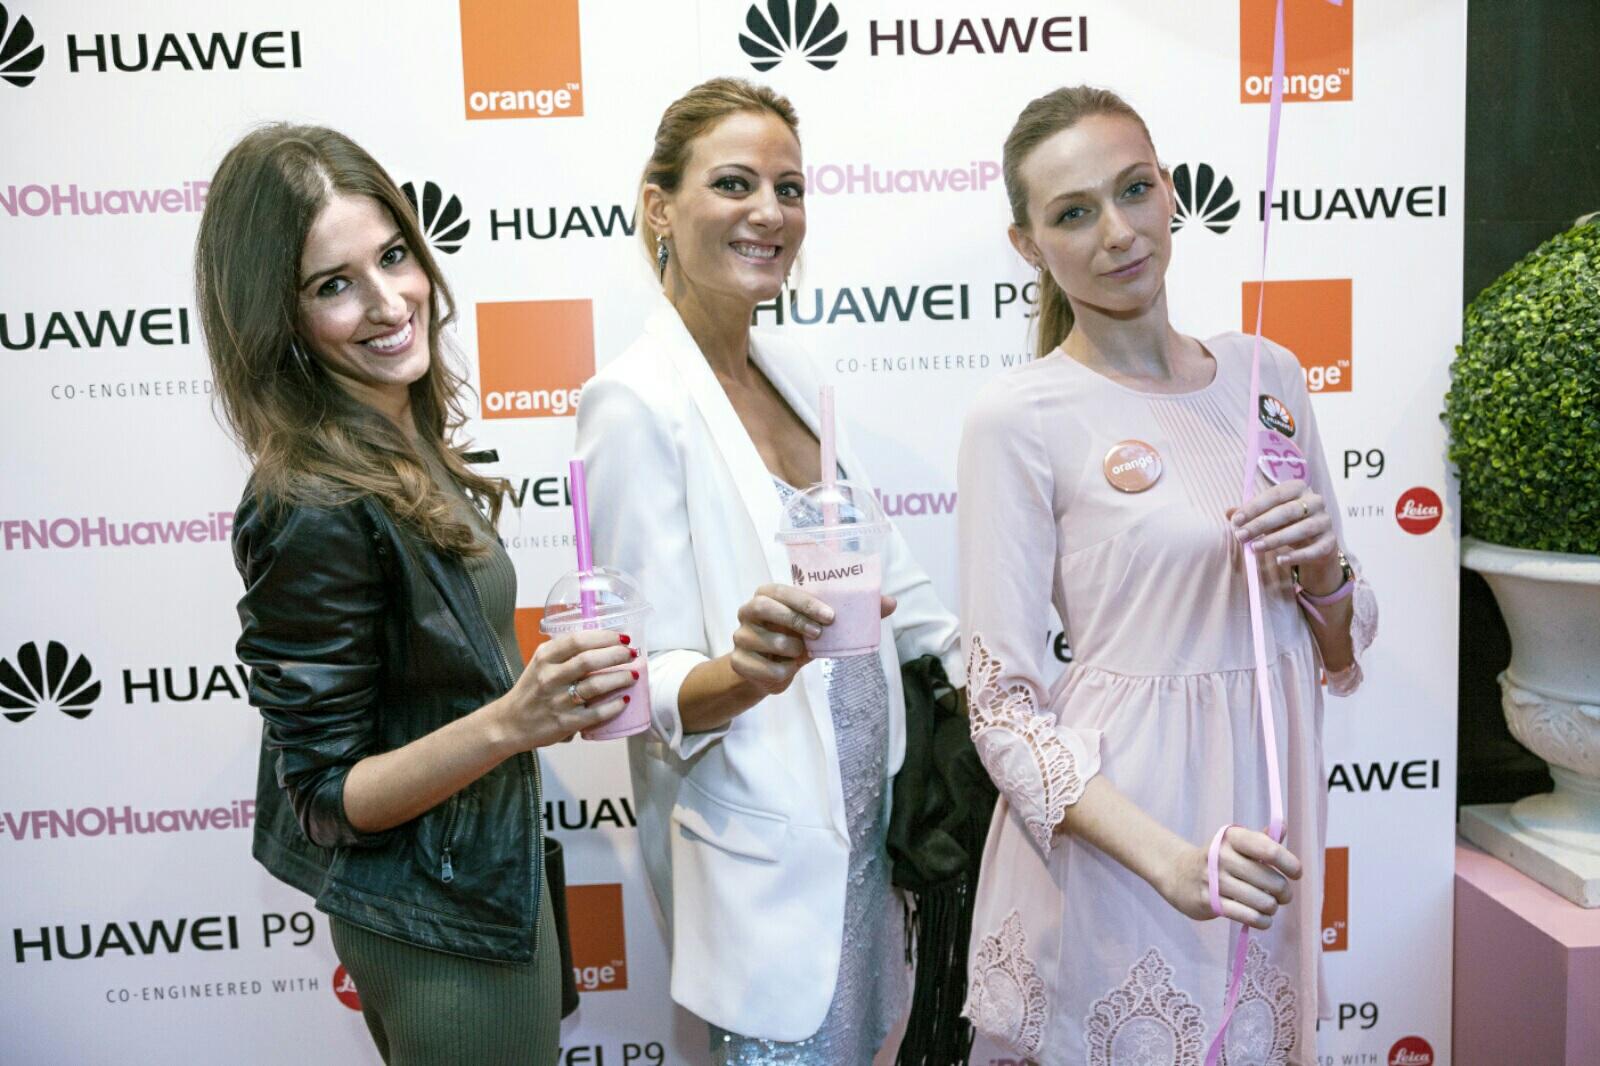 VFNO Huawei P9 invitada perfecta